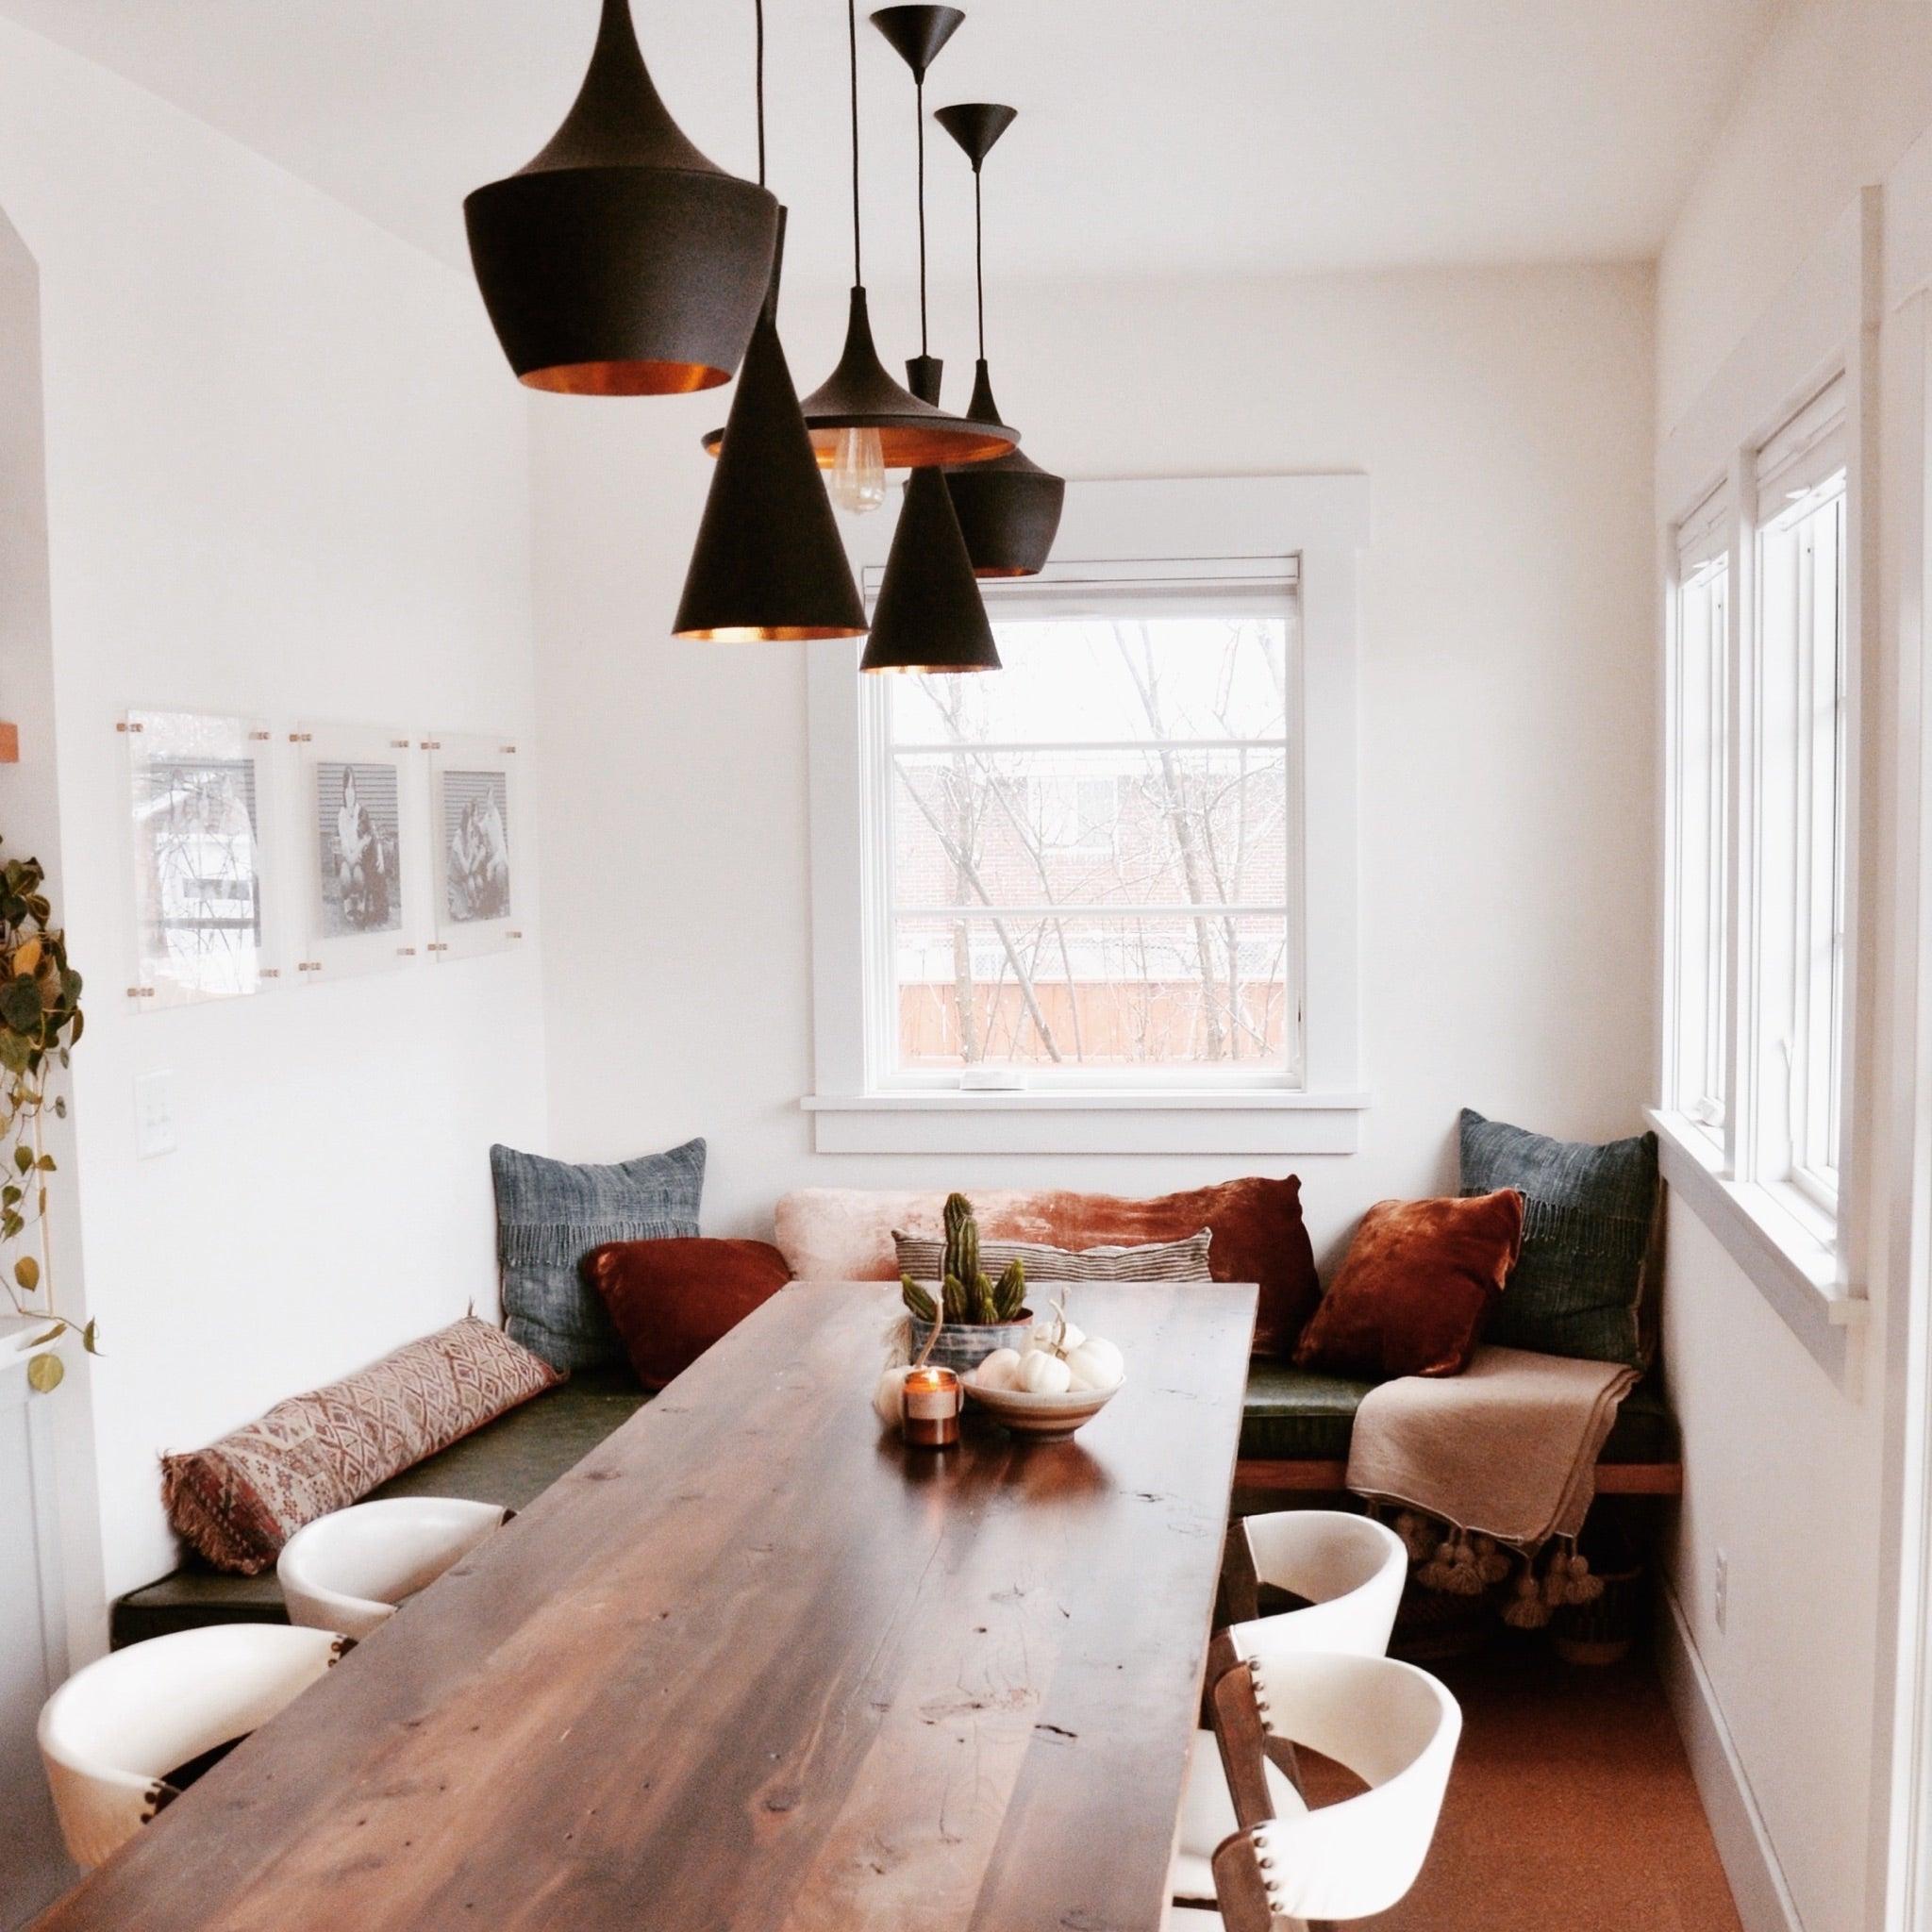 How to Increase Positive Energy through Your Home Decor